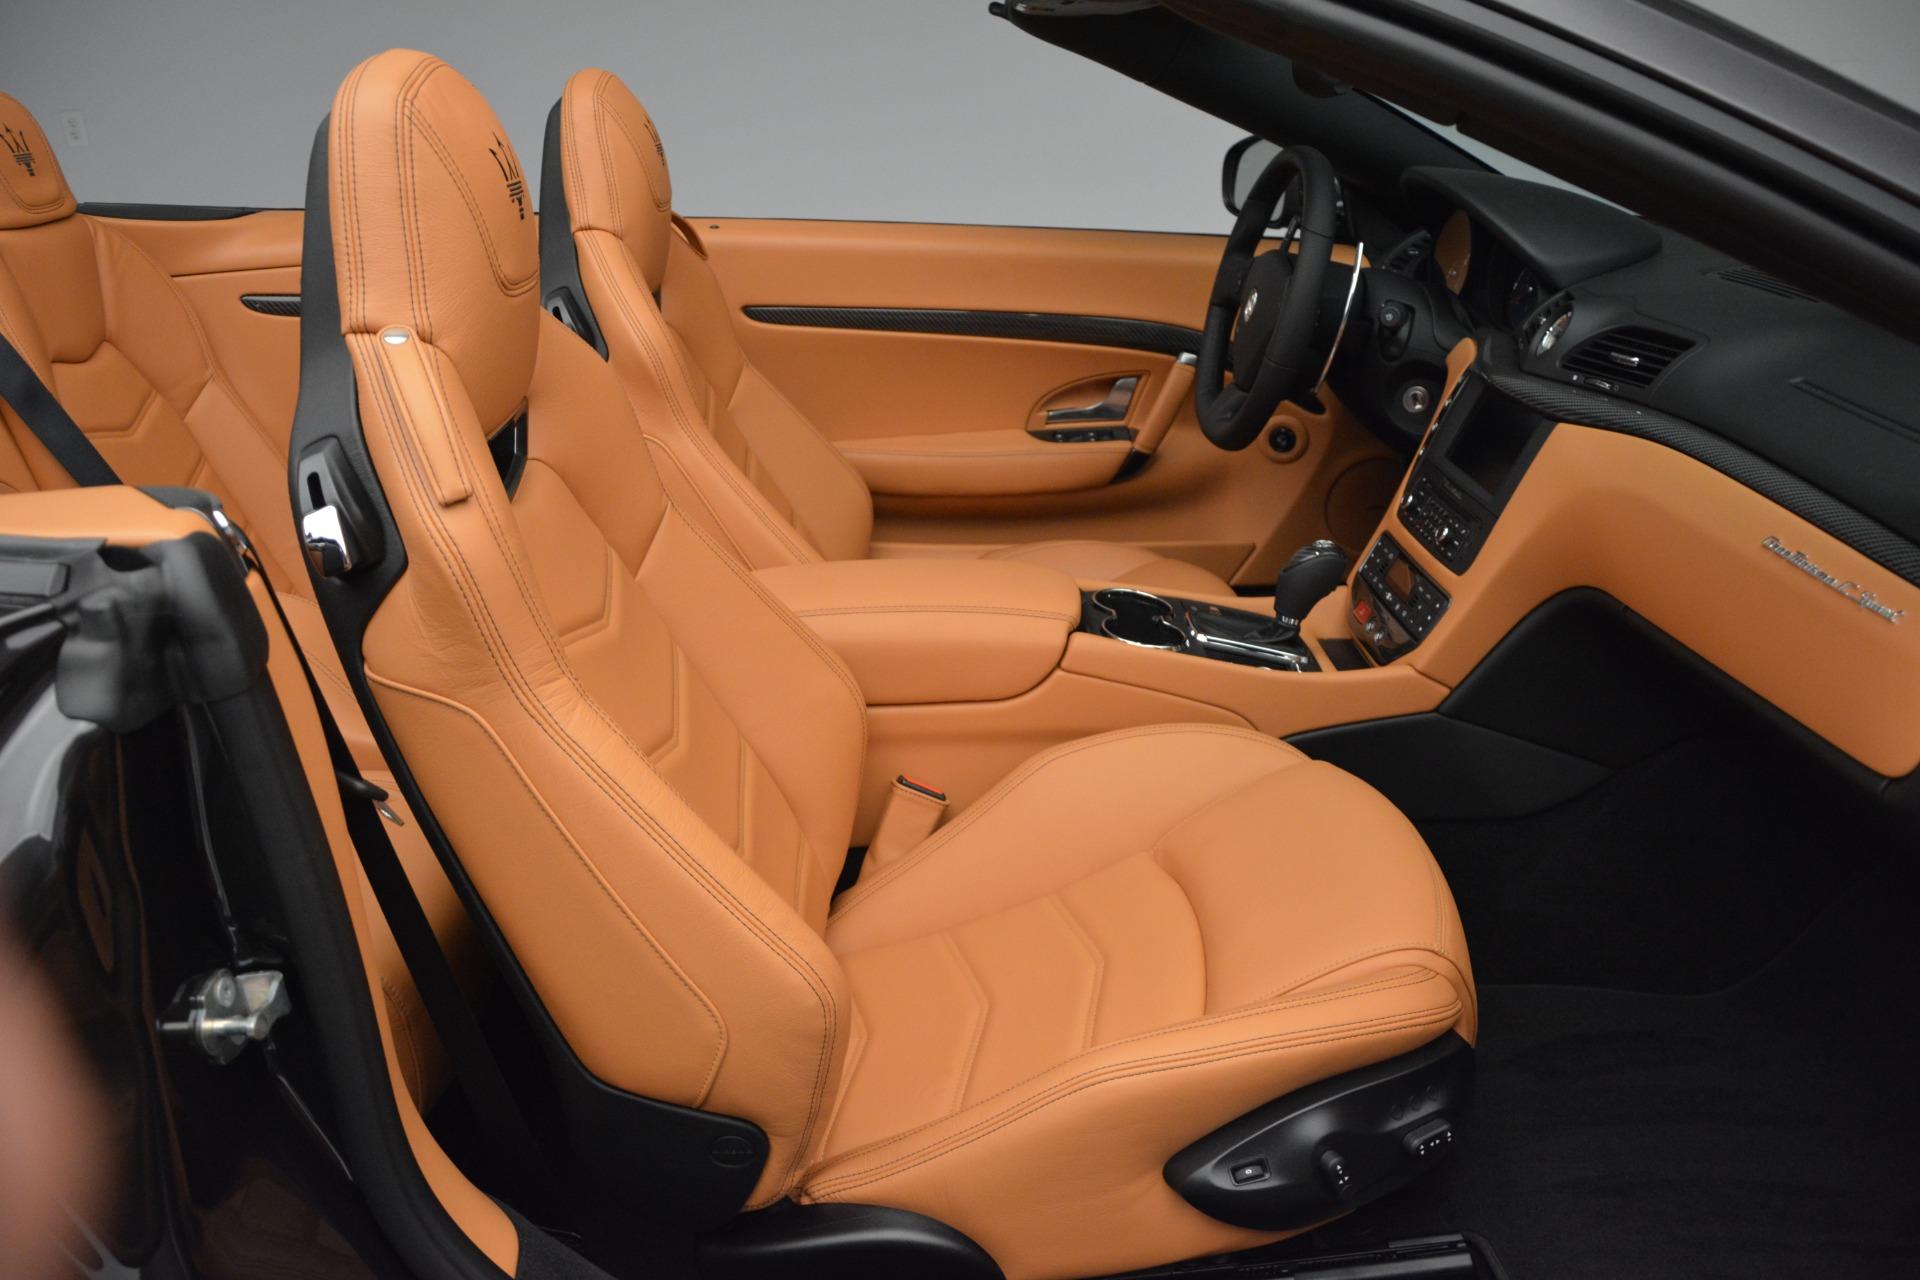 Used 2015 Maserati GranTurismo Sport Convertible For Sale In Westport, CT 2129_p24